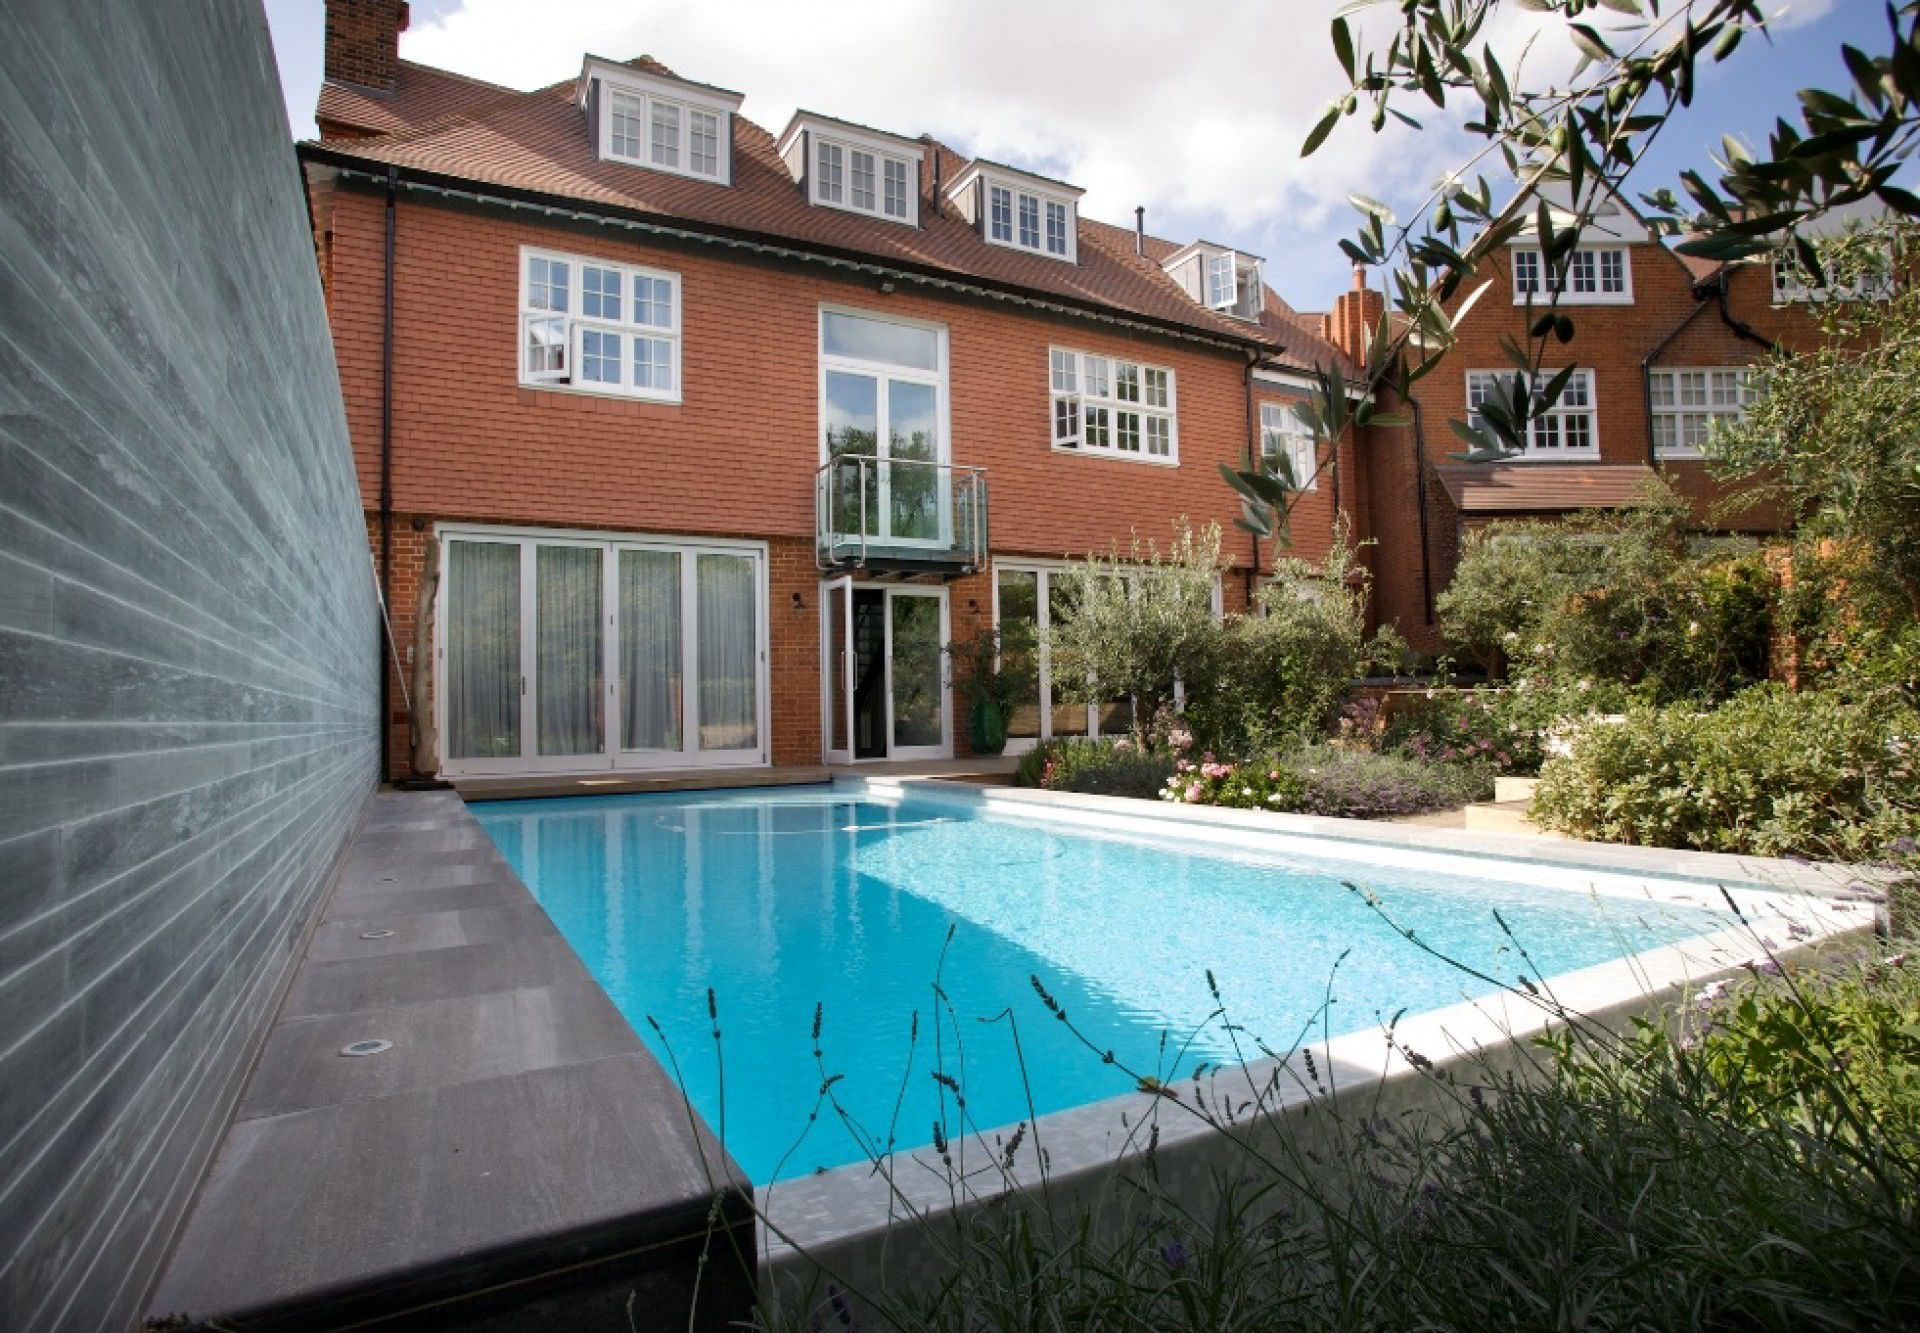 Piscine Enterree Hampstead Guncast Swimming Pools En Beton